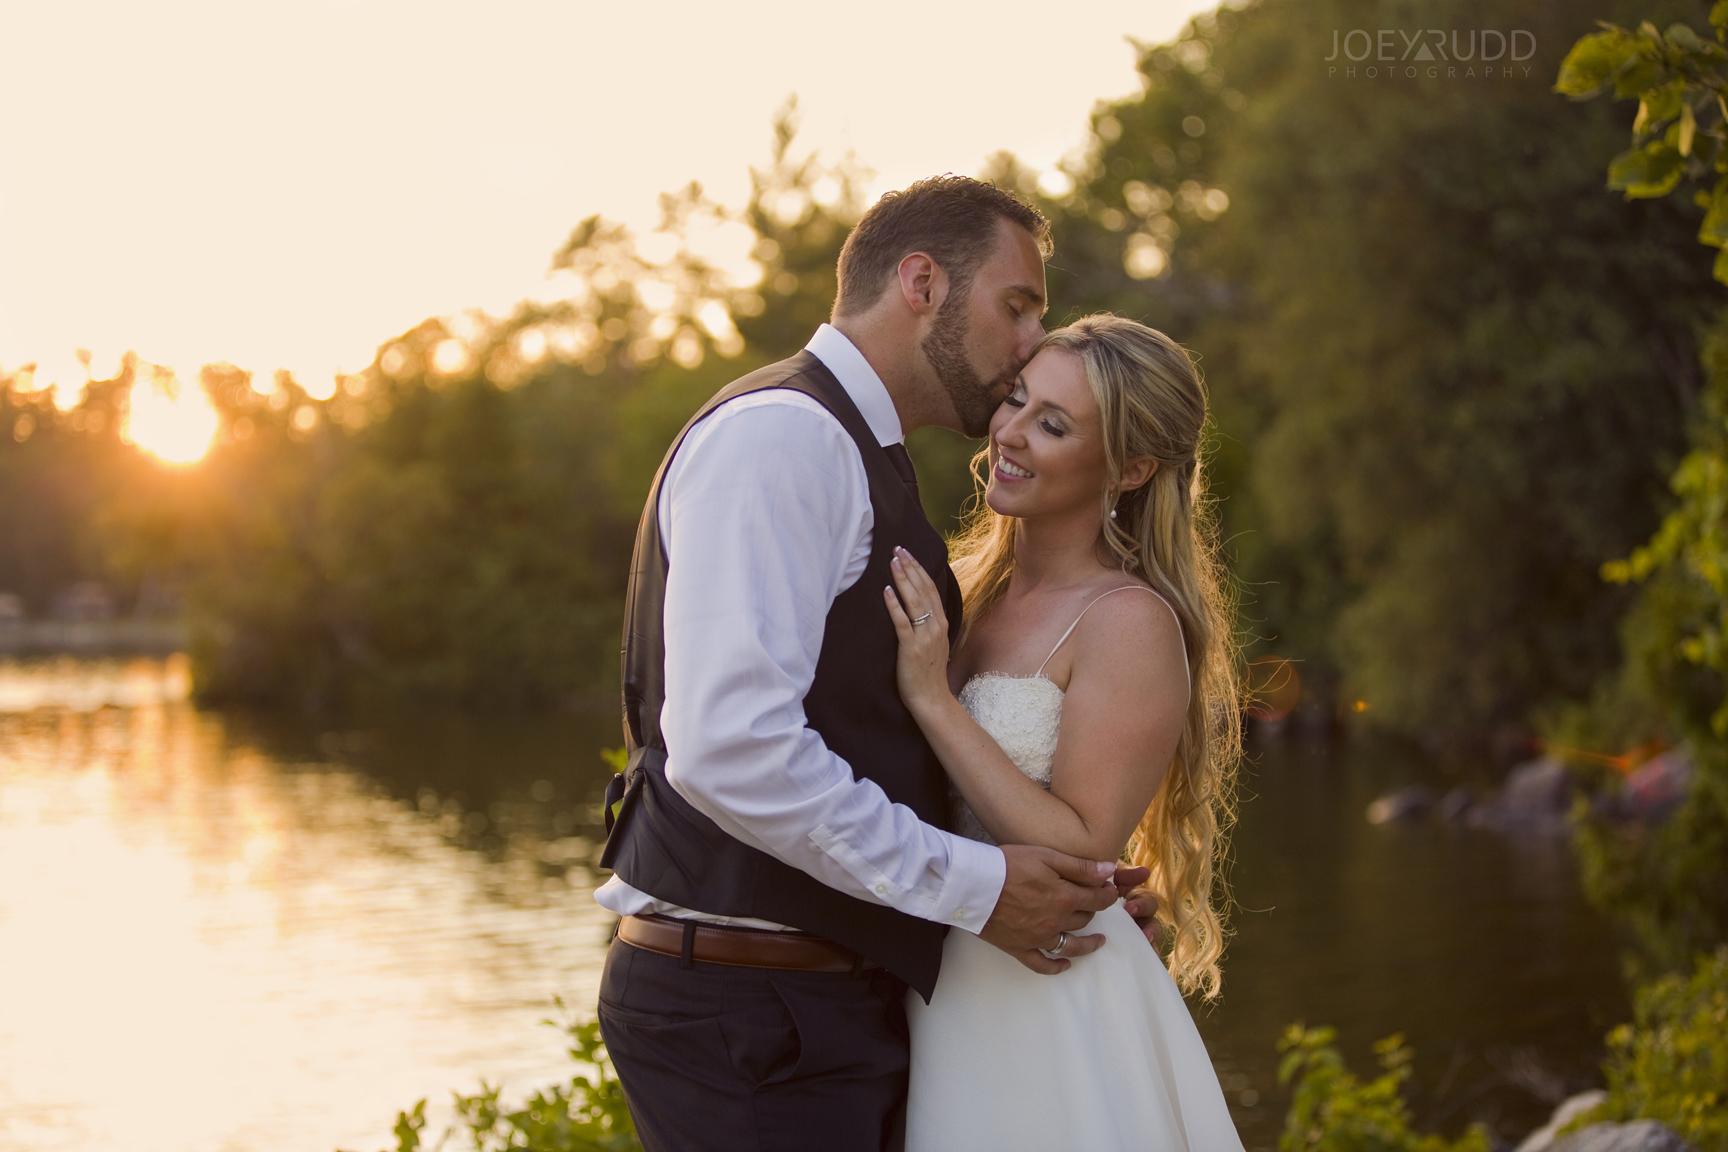 Calabogie Wedding at Barnet Park by Ottawa Wedding Photographer Joey Rudd Photography Sunset Photo